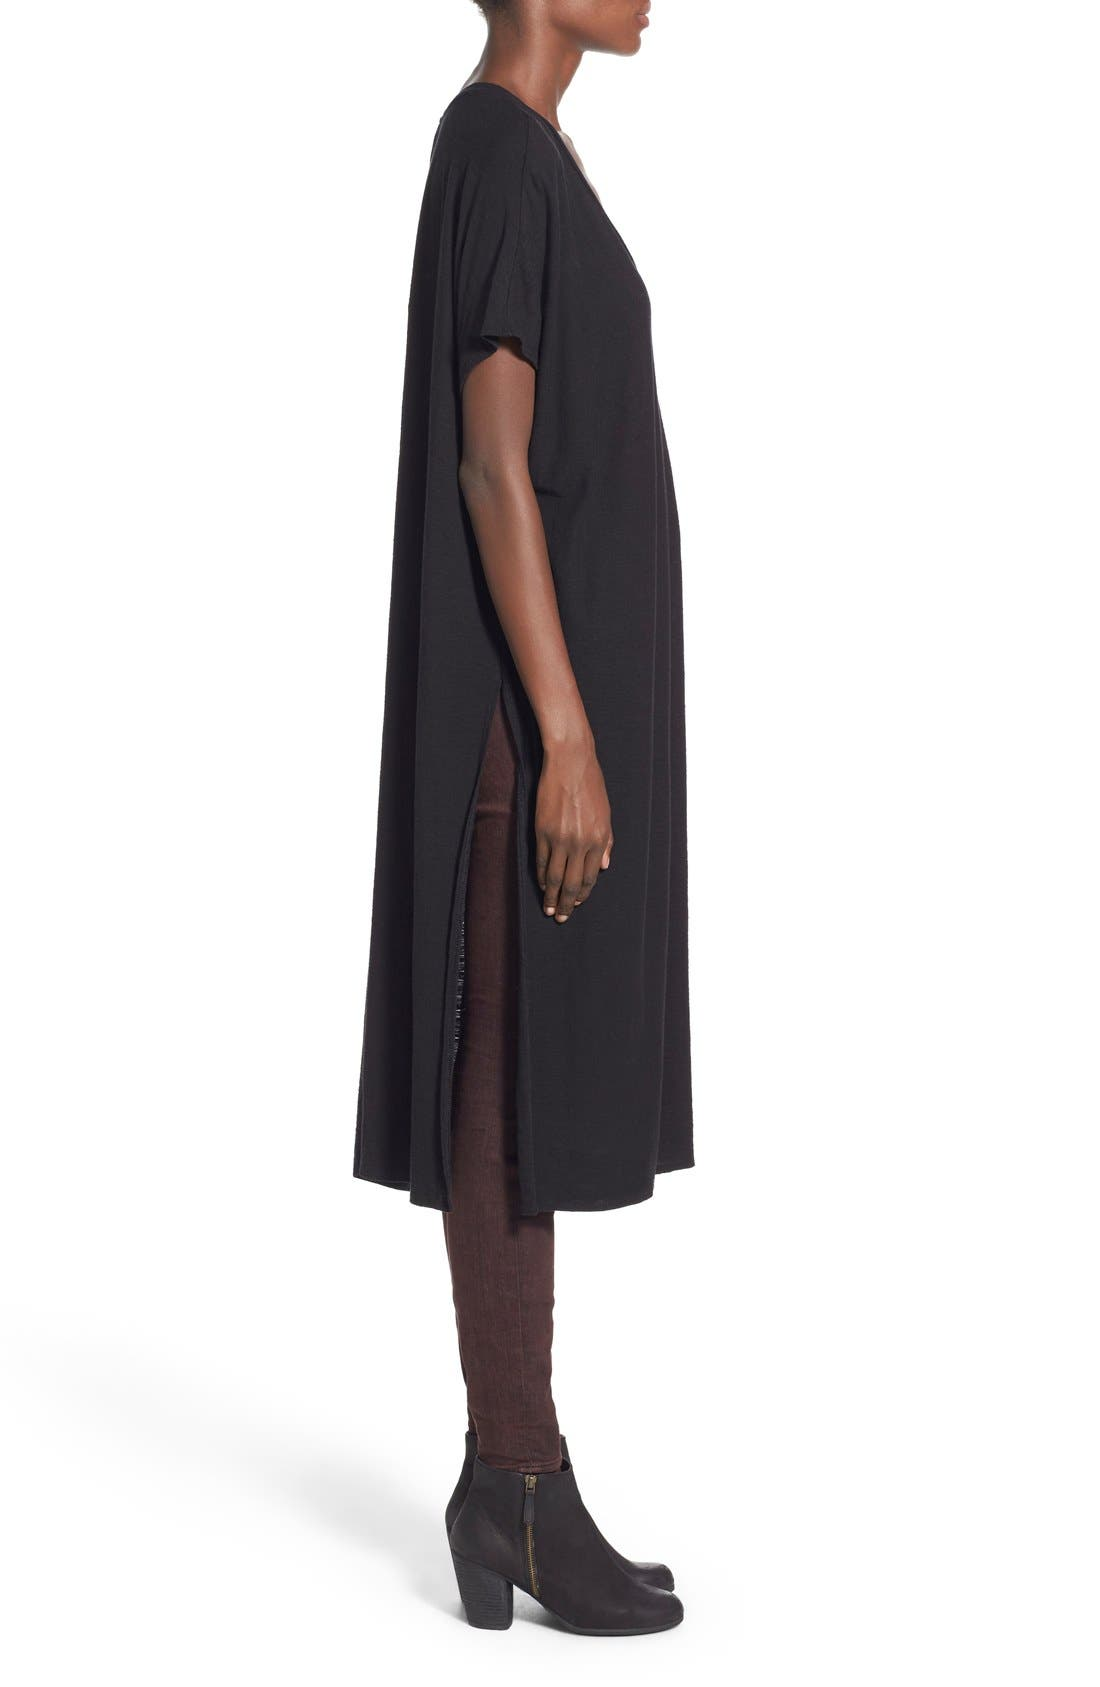 Alternate Image 3  - Michelle by Comune 'Hayward' V-Neck T-Shirt Dress